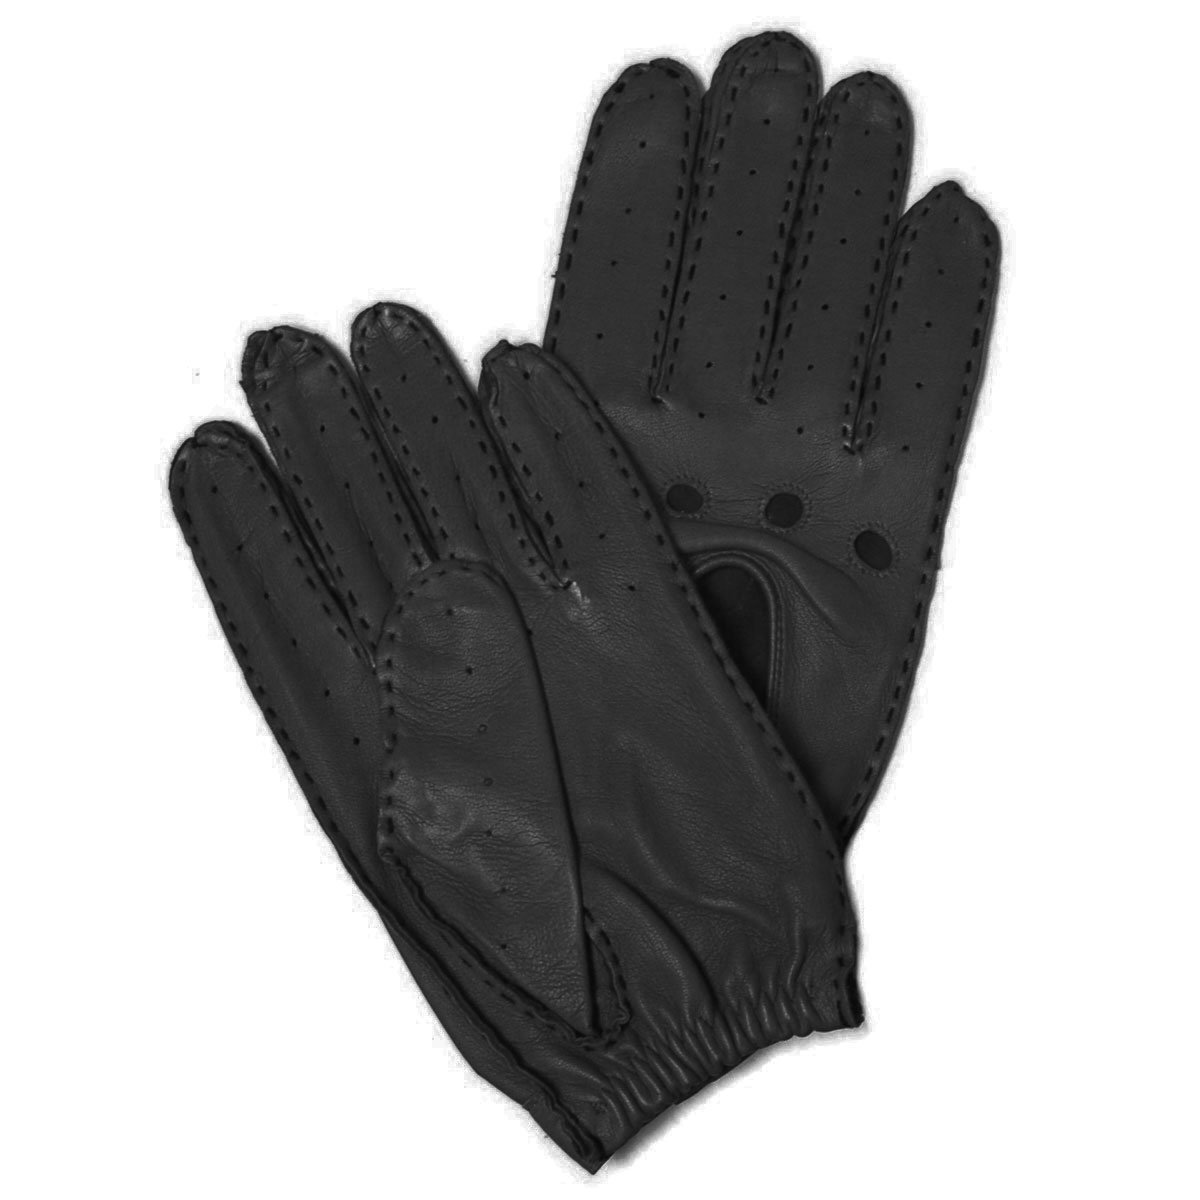 Hilts-Willard Men's Leather Driving Gloves - L - Black